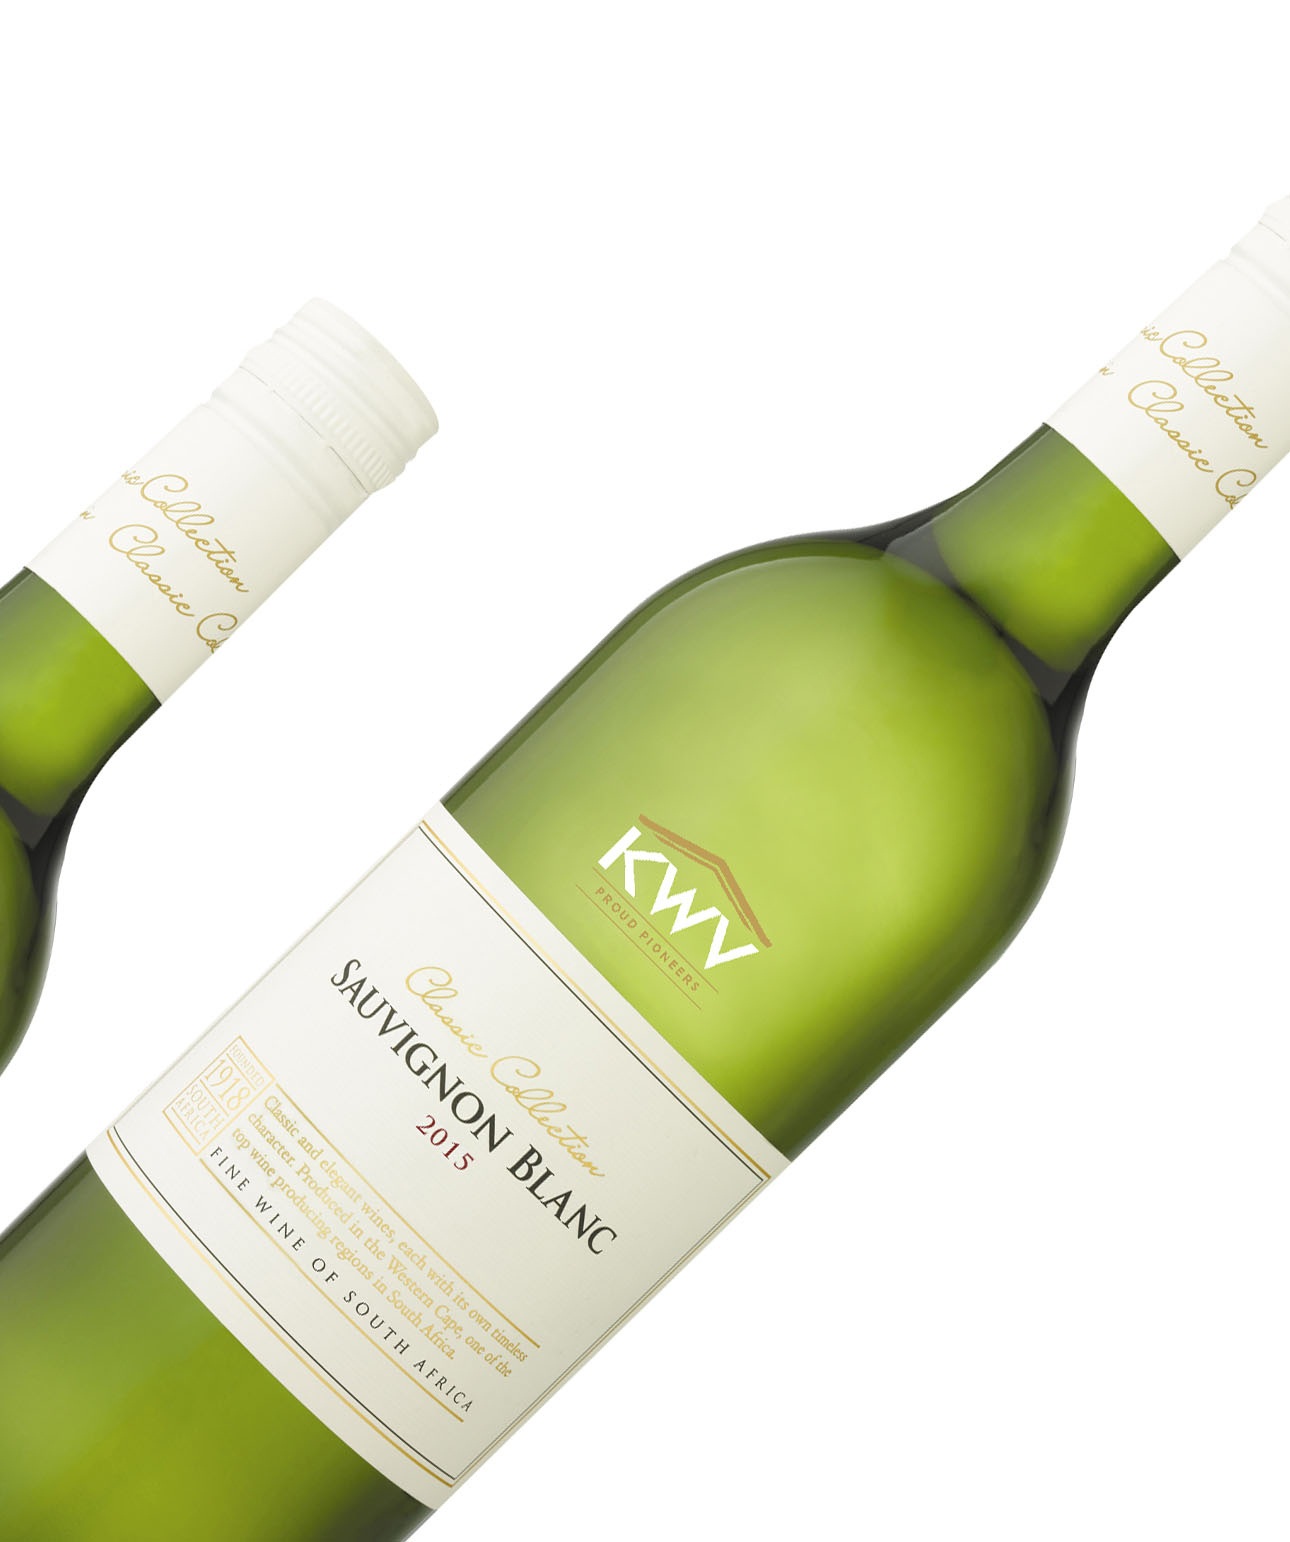 KWV Classic Sauvignon Blanc 2016